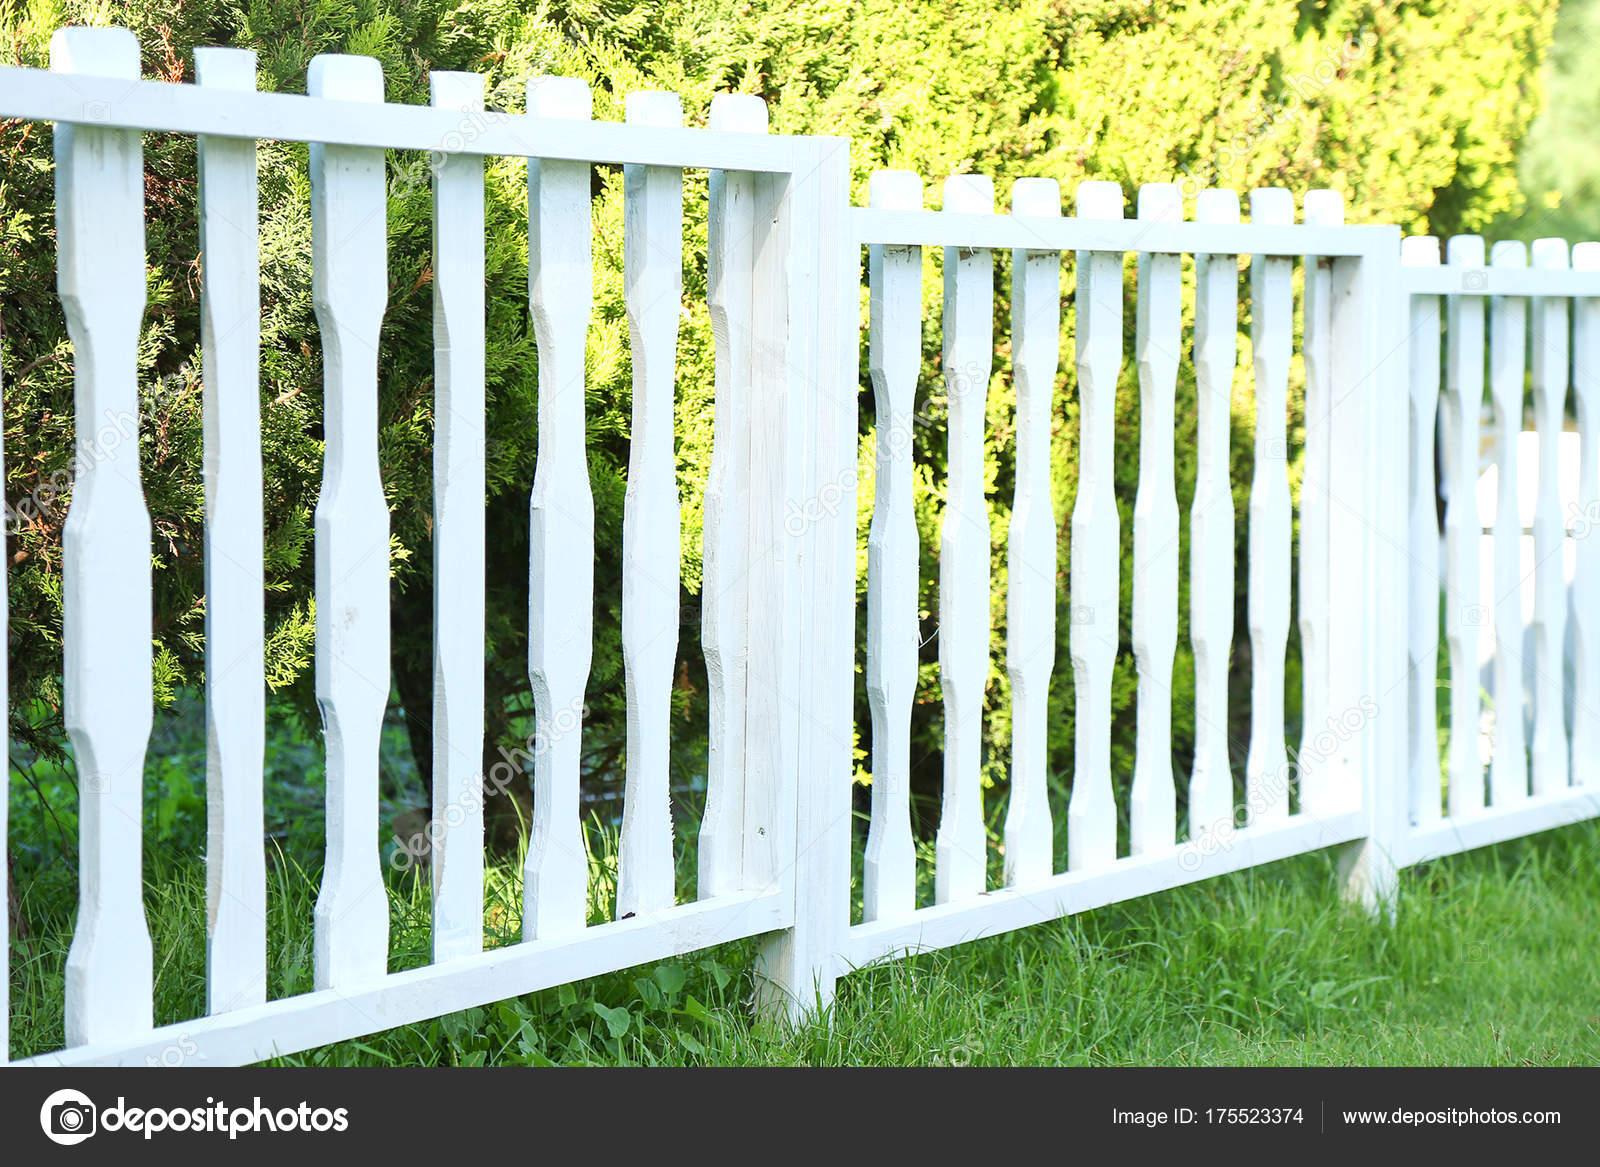 weiße holzzaun — stockfoto © aleksashka_89 #175523374